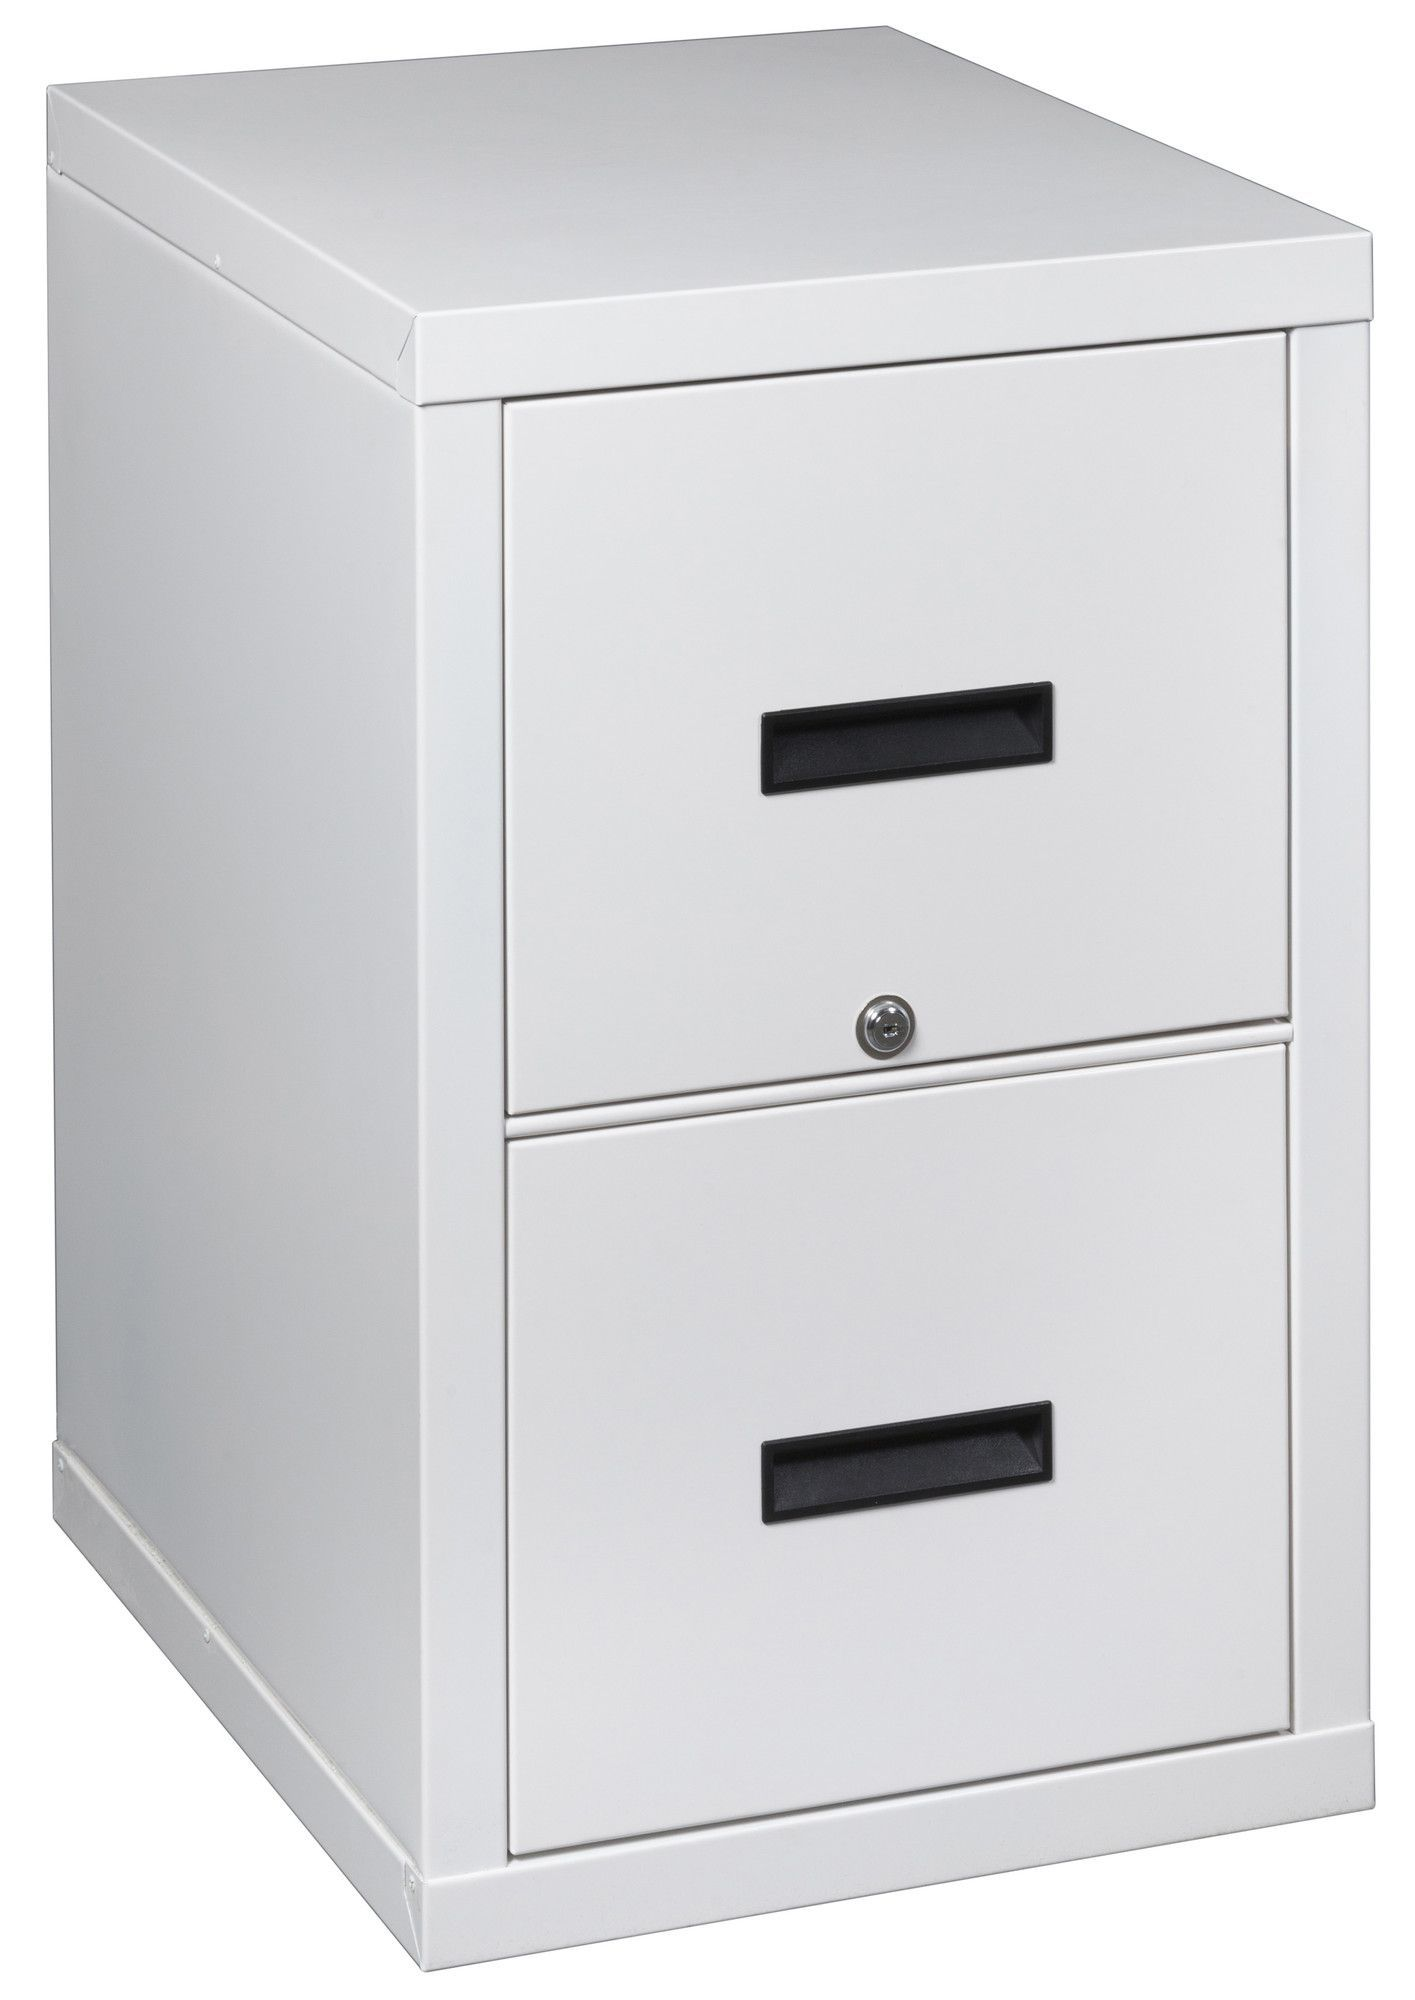 Fireshield drawer light weight fireproof filing cabinet small